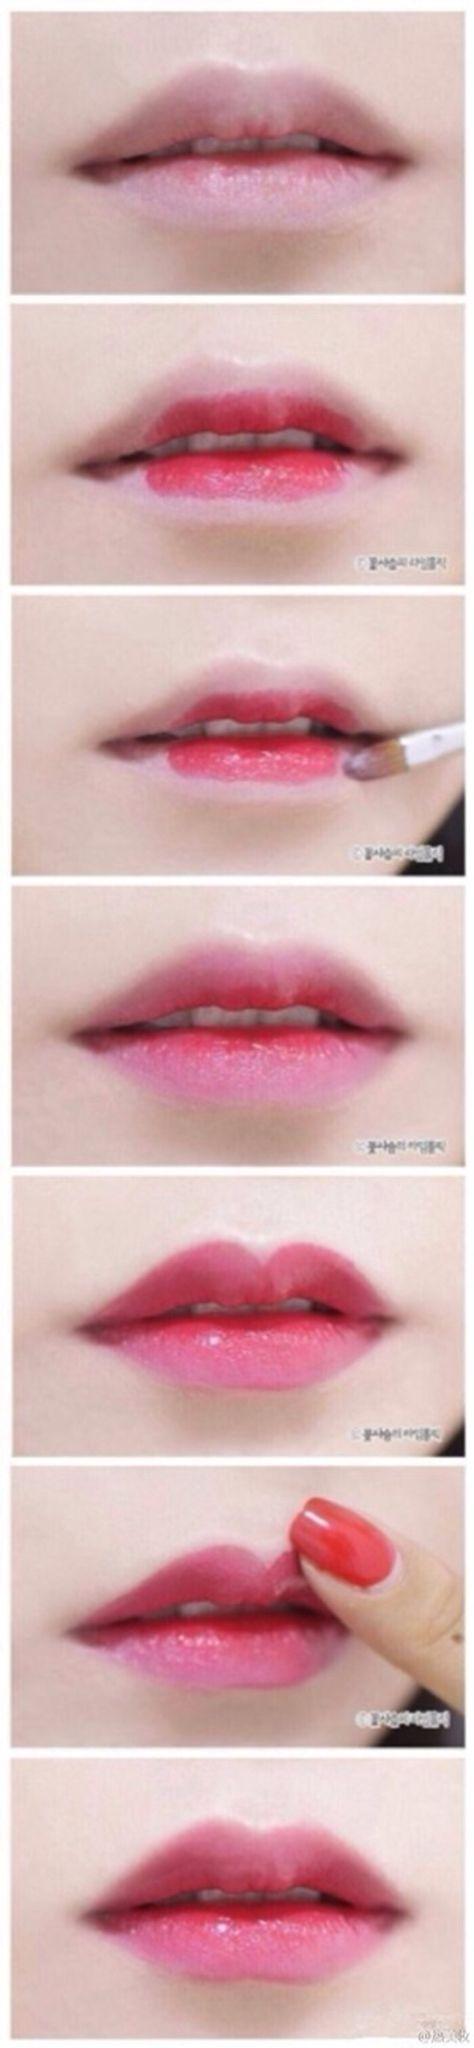 Lip makeup                                                                                                                                                                                 More